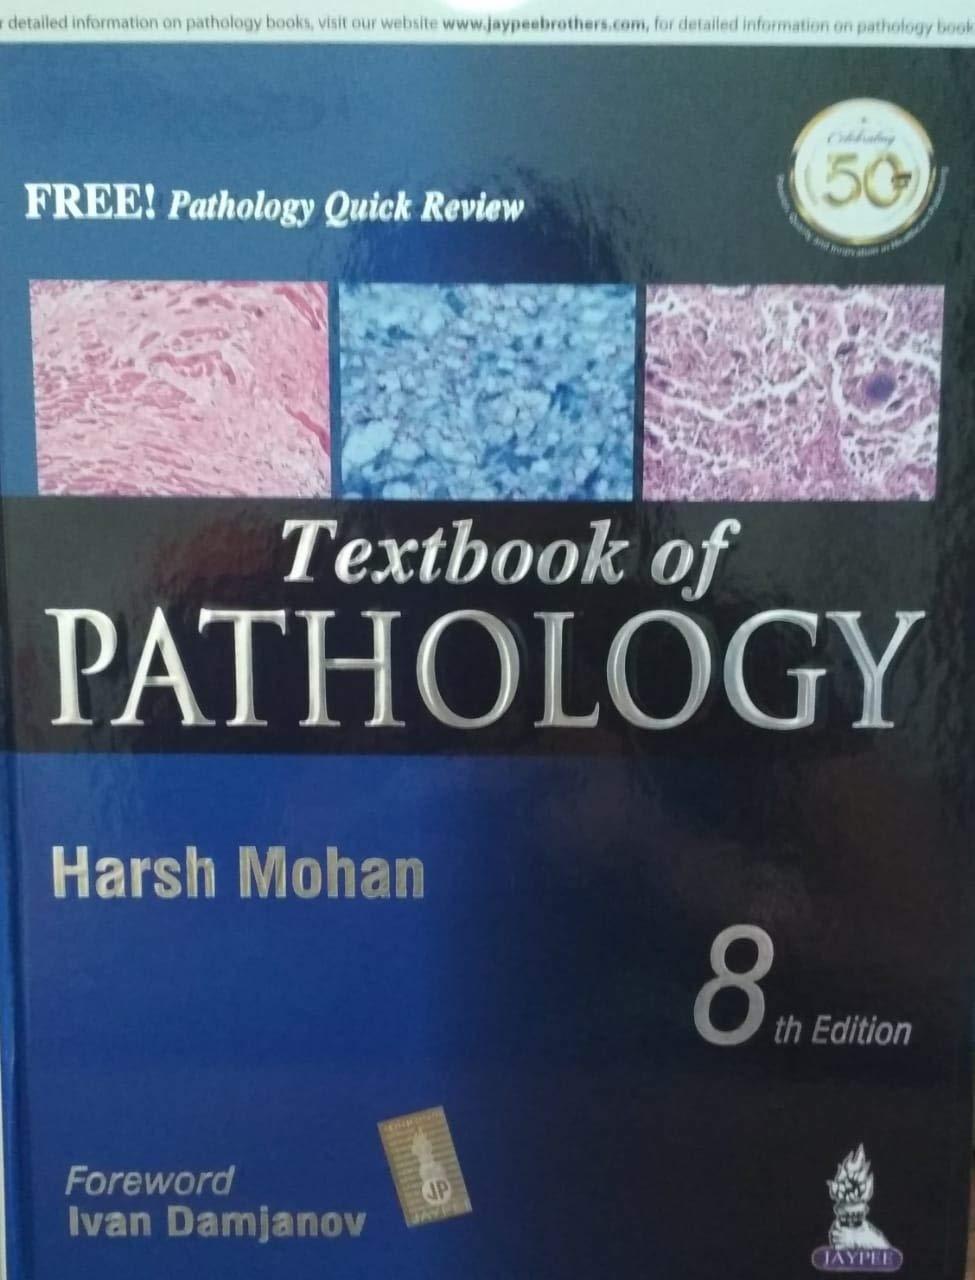 Buy Textbook of Pathology   Harsh Mohan   20th Editionenglish ...